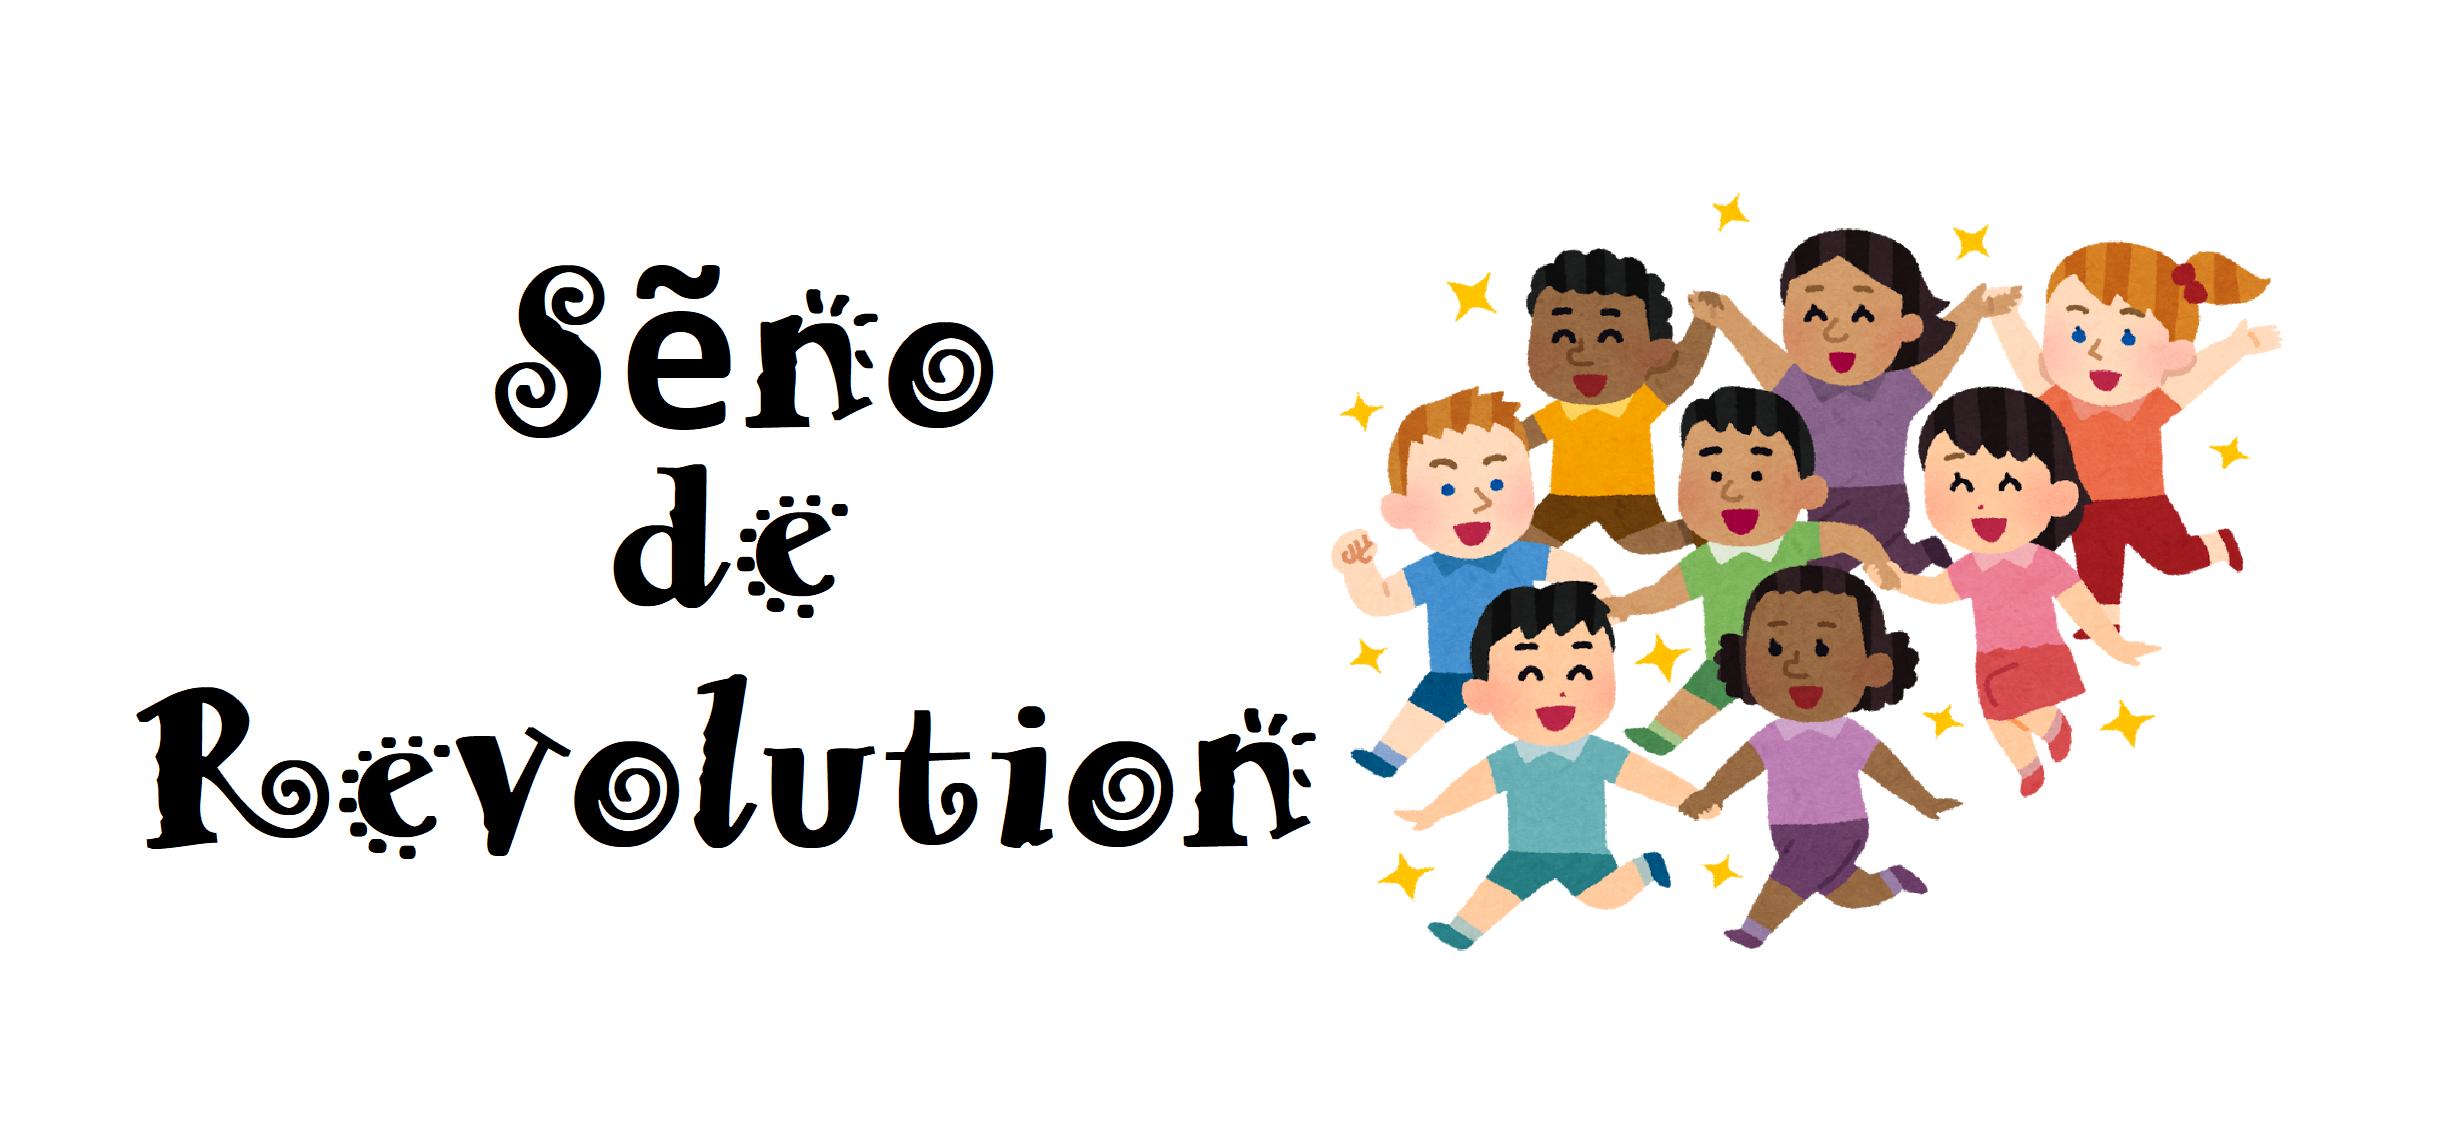 「Sẽno de Revolution」のイメージ